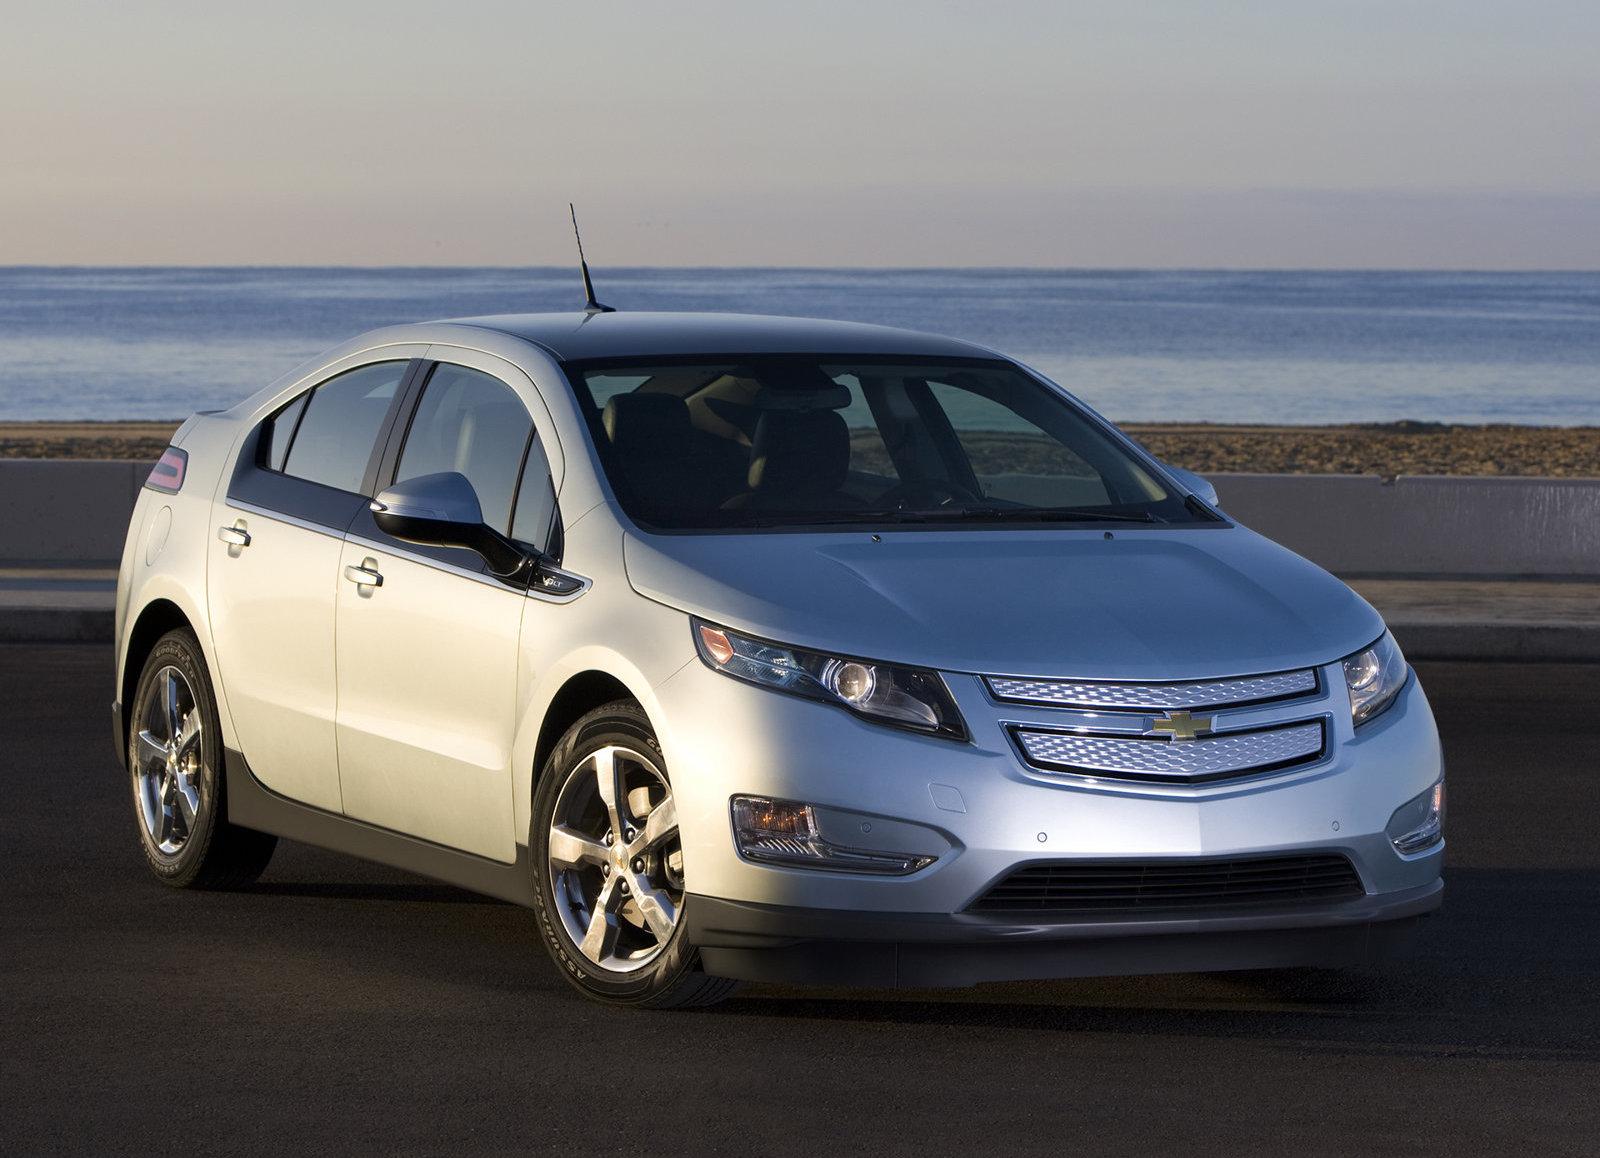 2011 Chevrolet Volt Front 3/4